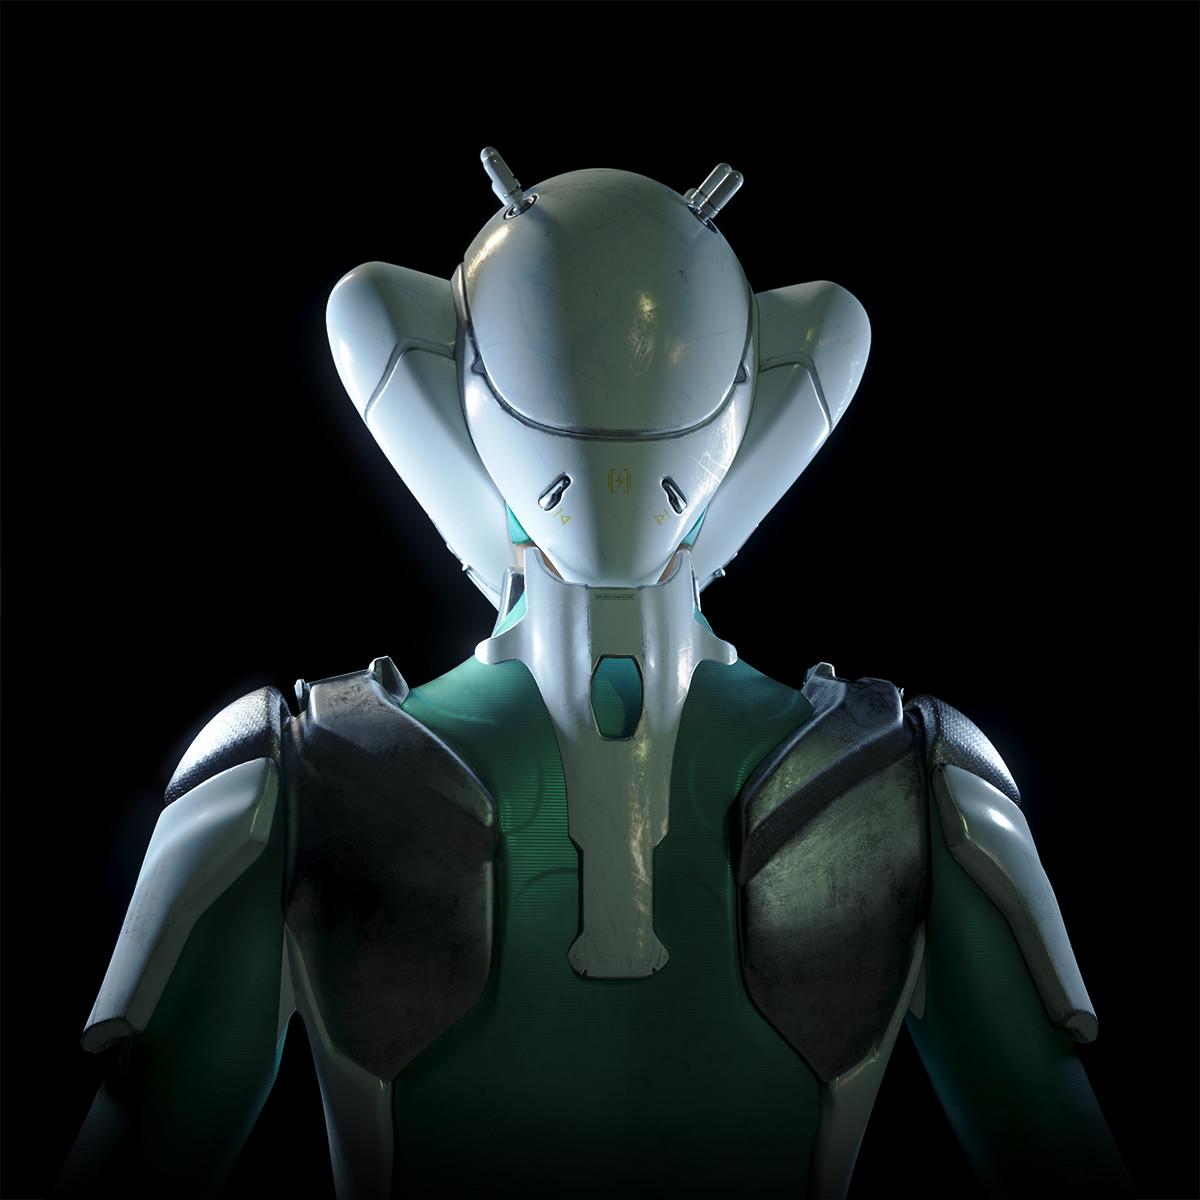 Arthur gurin 4 mantis back